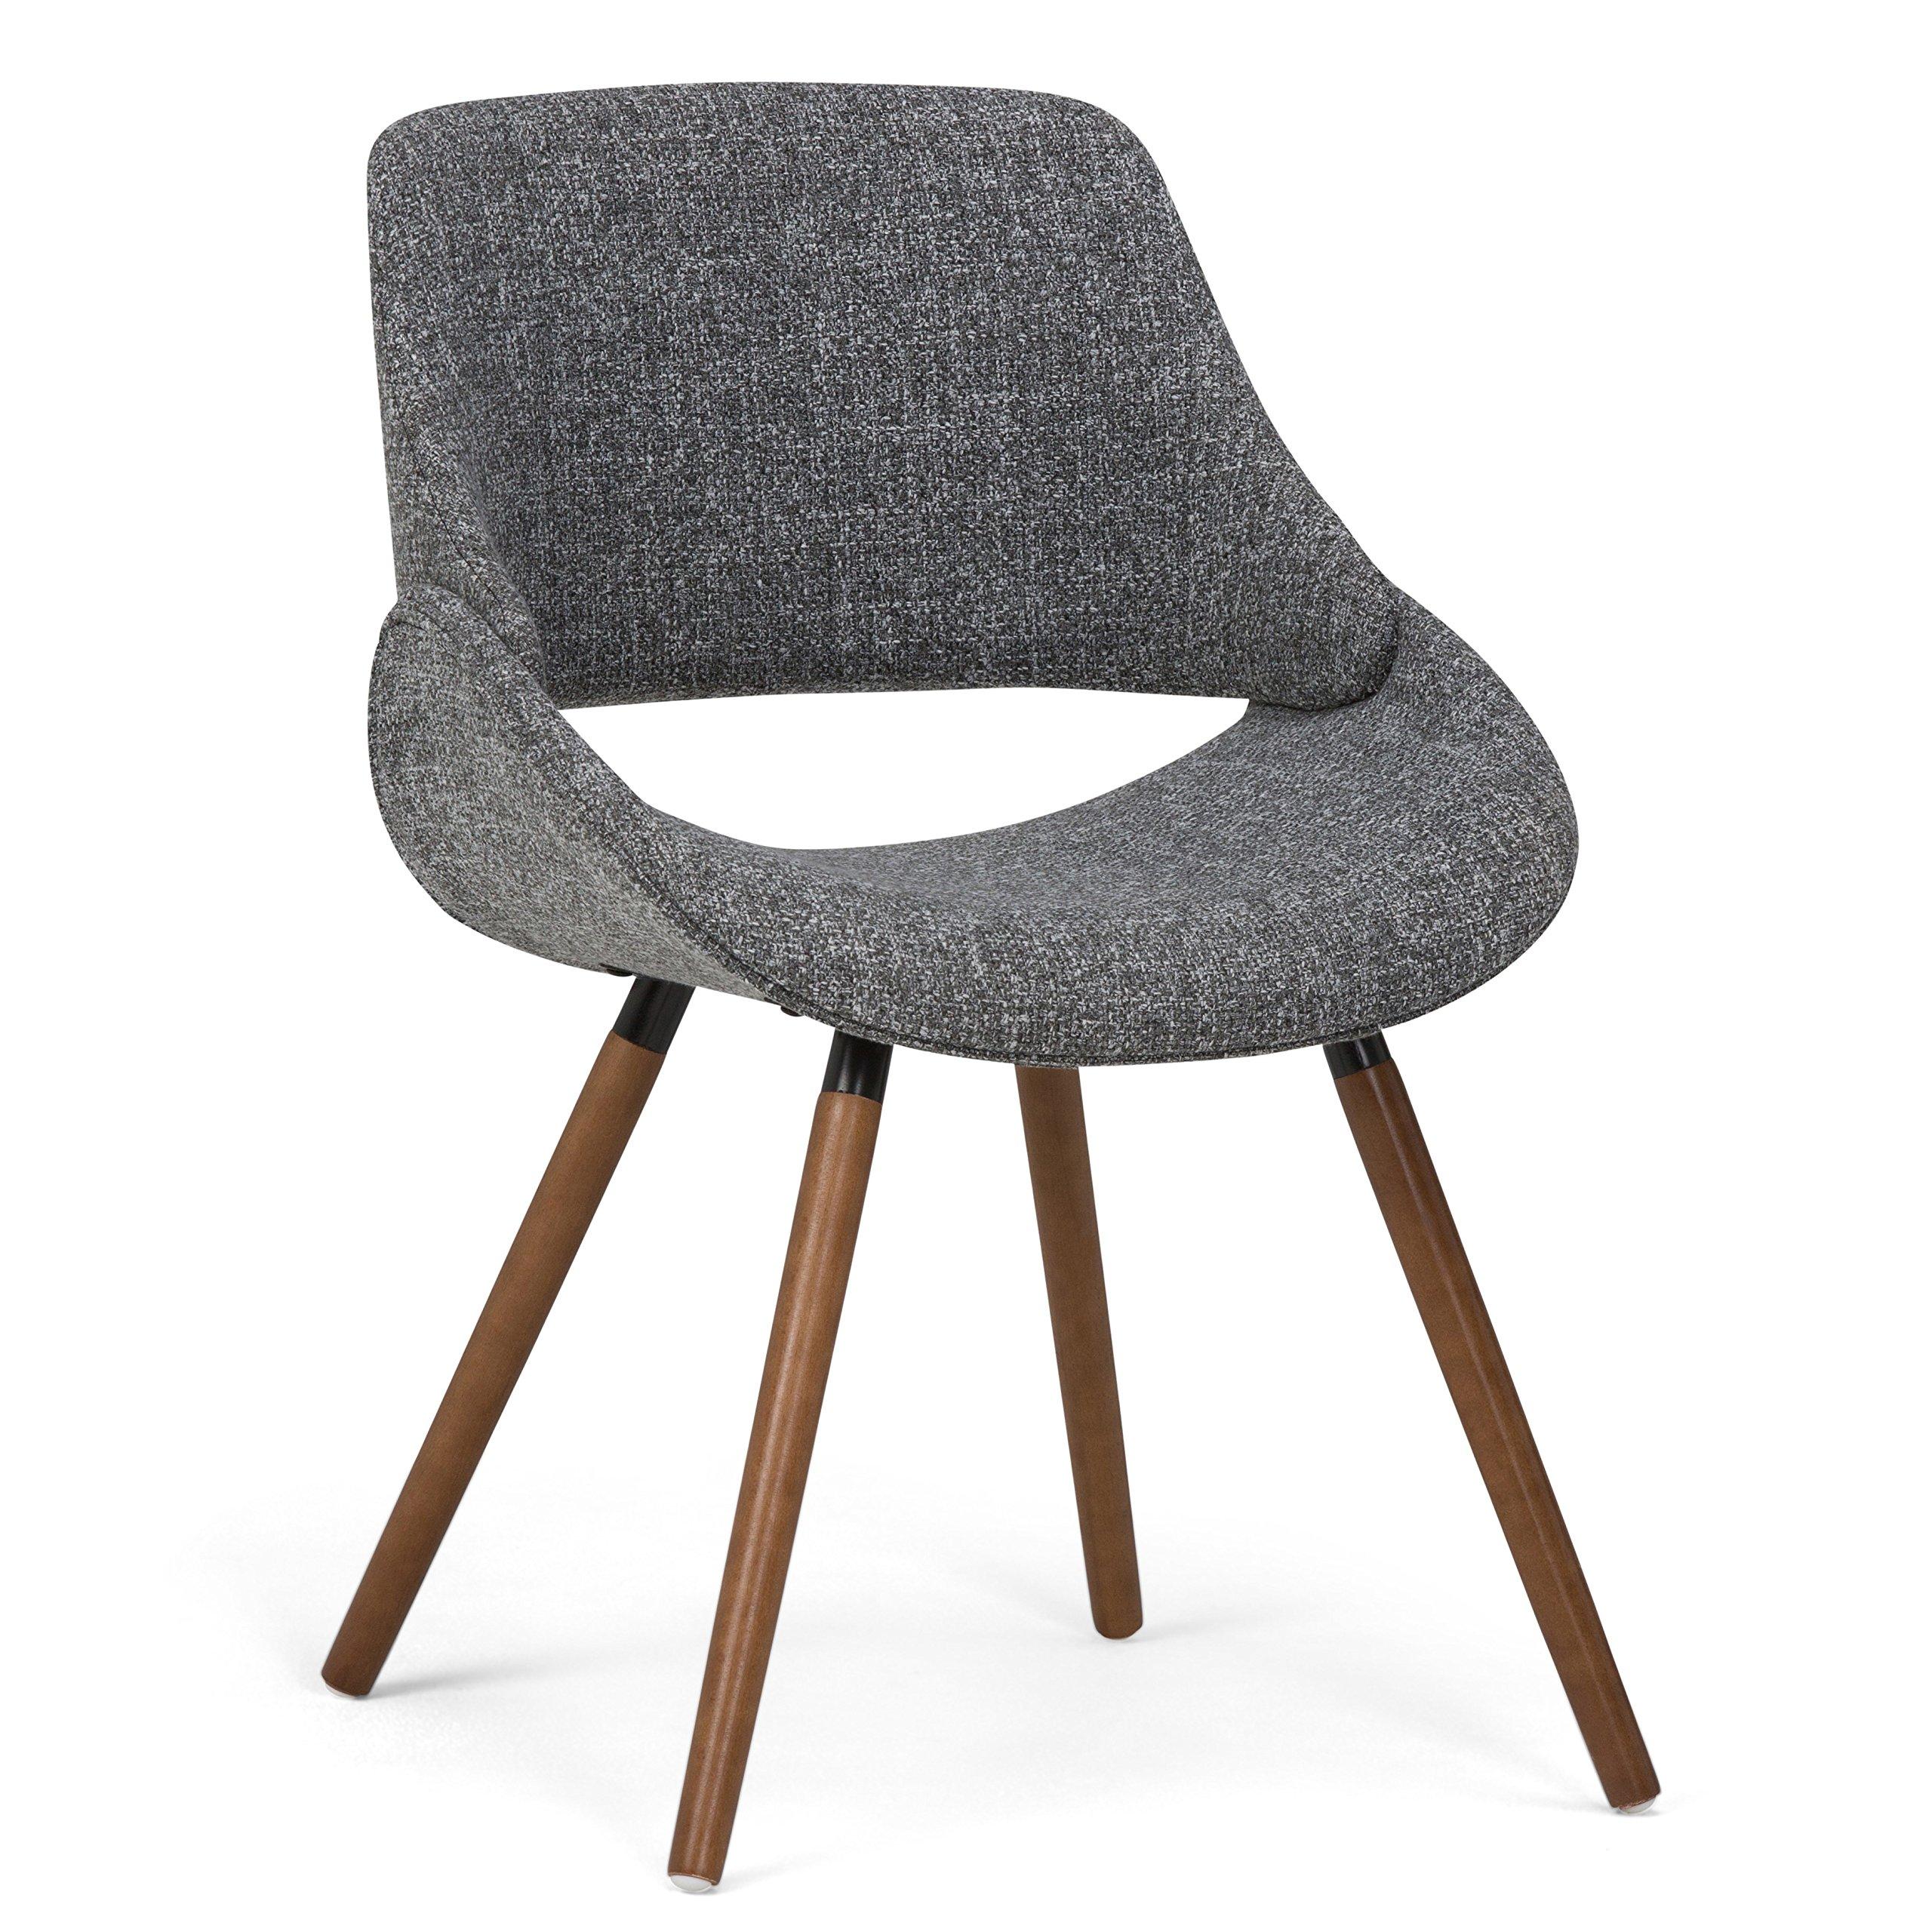 Simpli Home Malden Bentwood Dining Chair, Grey